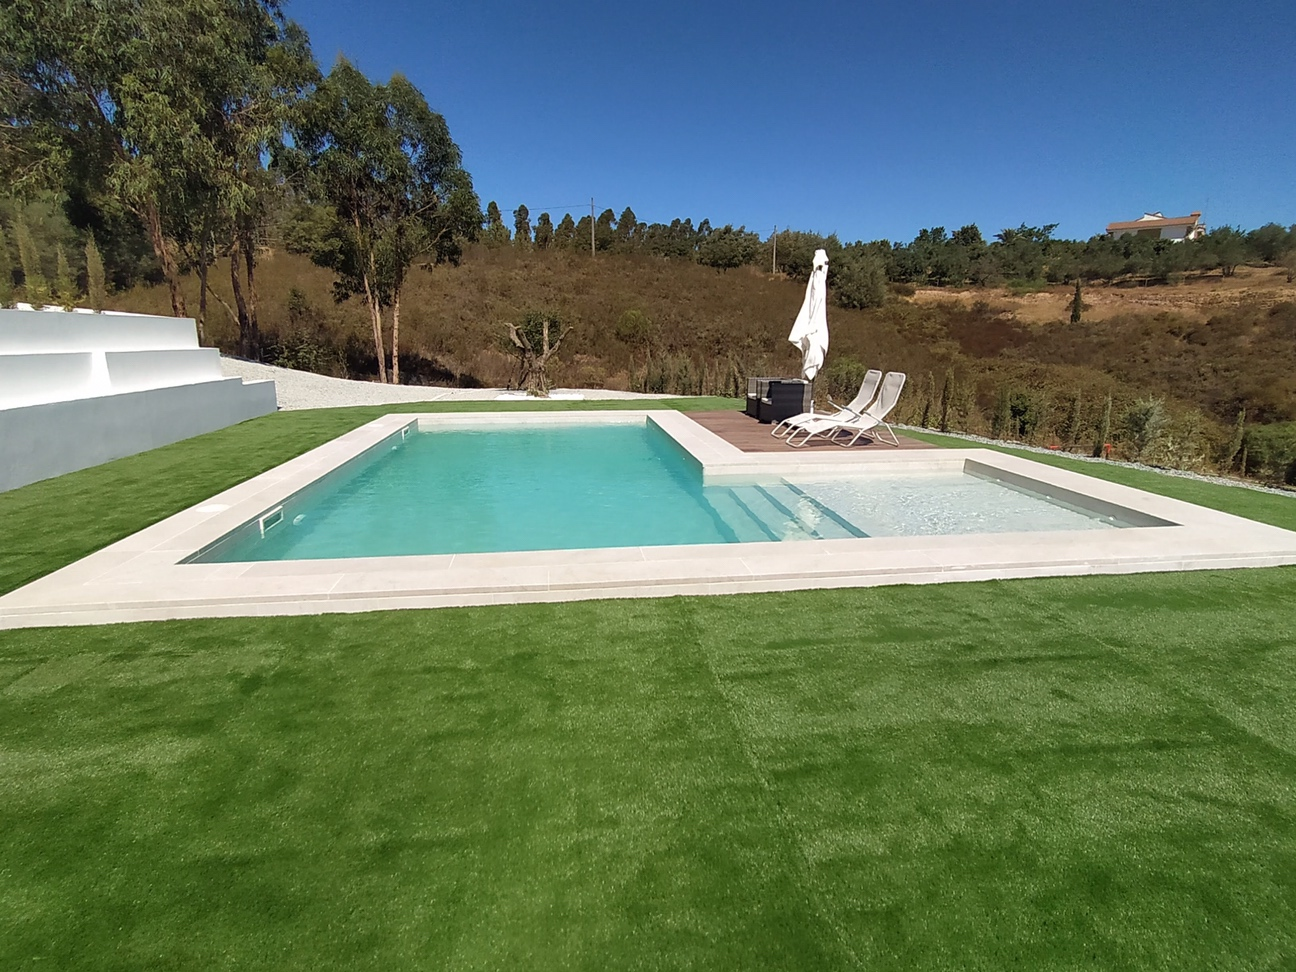 Entorno natural de la piscina de cerámica